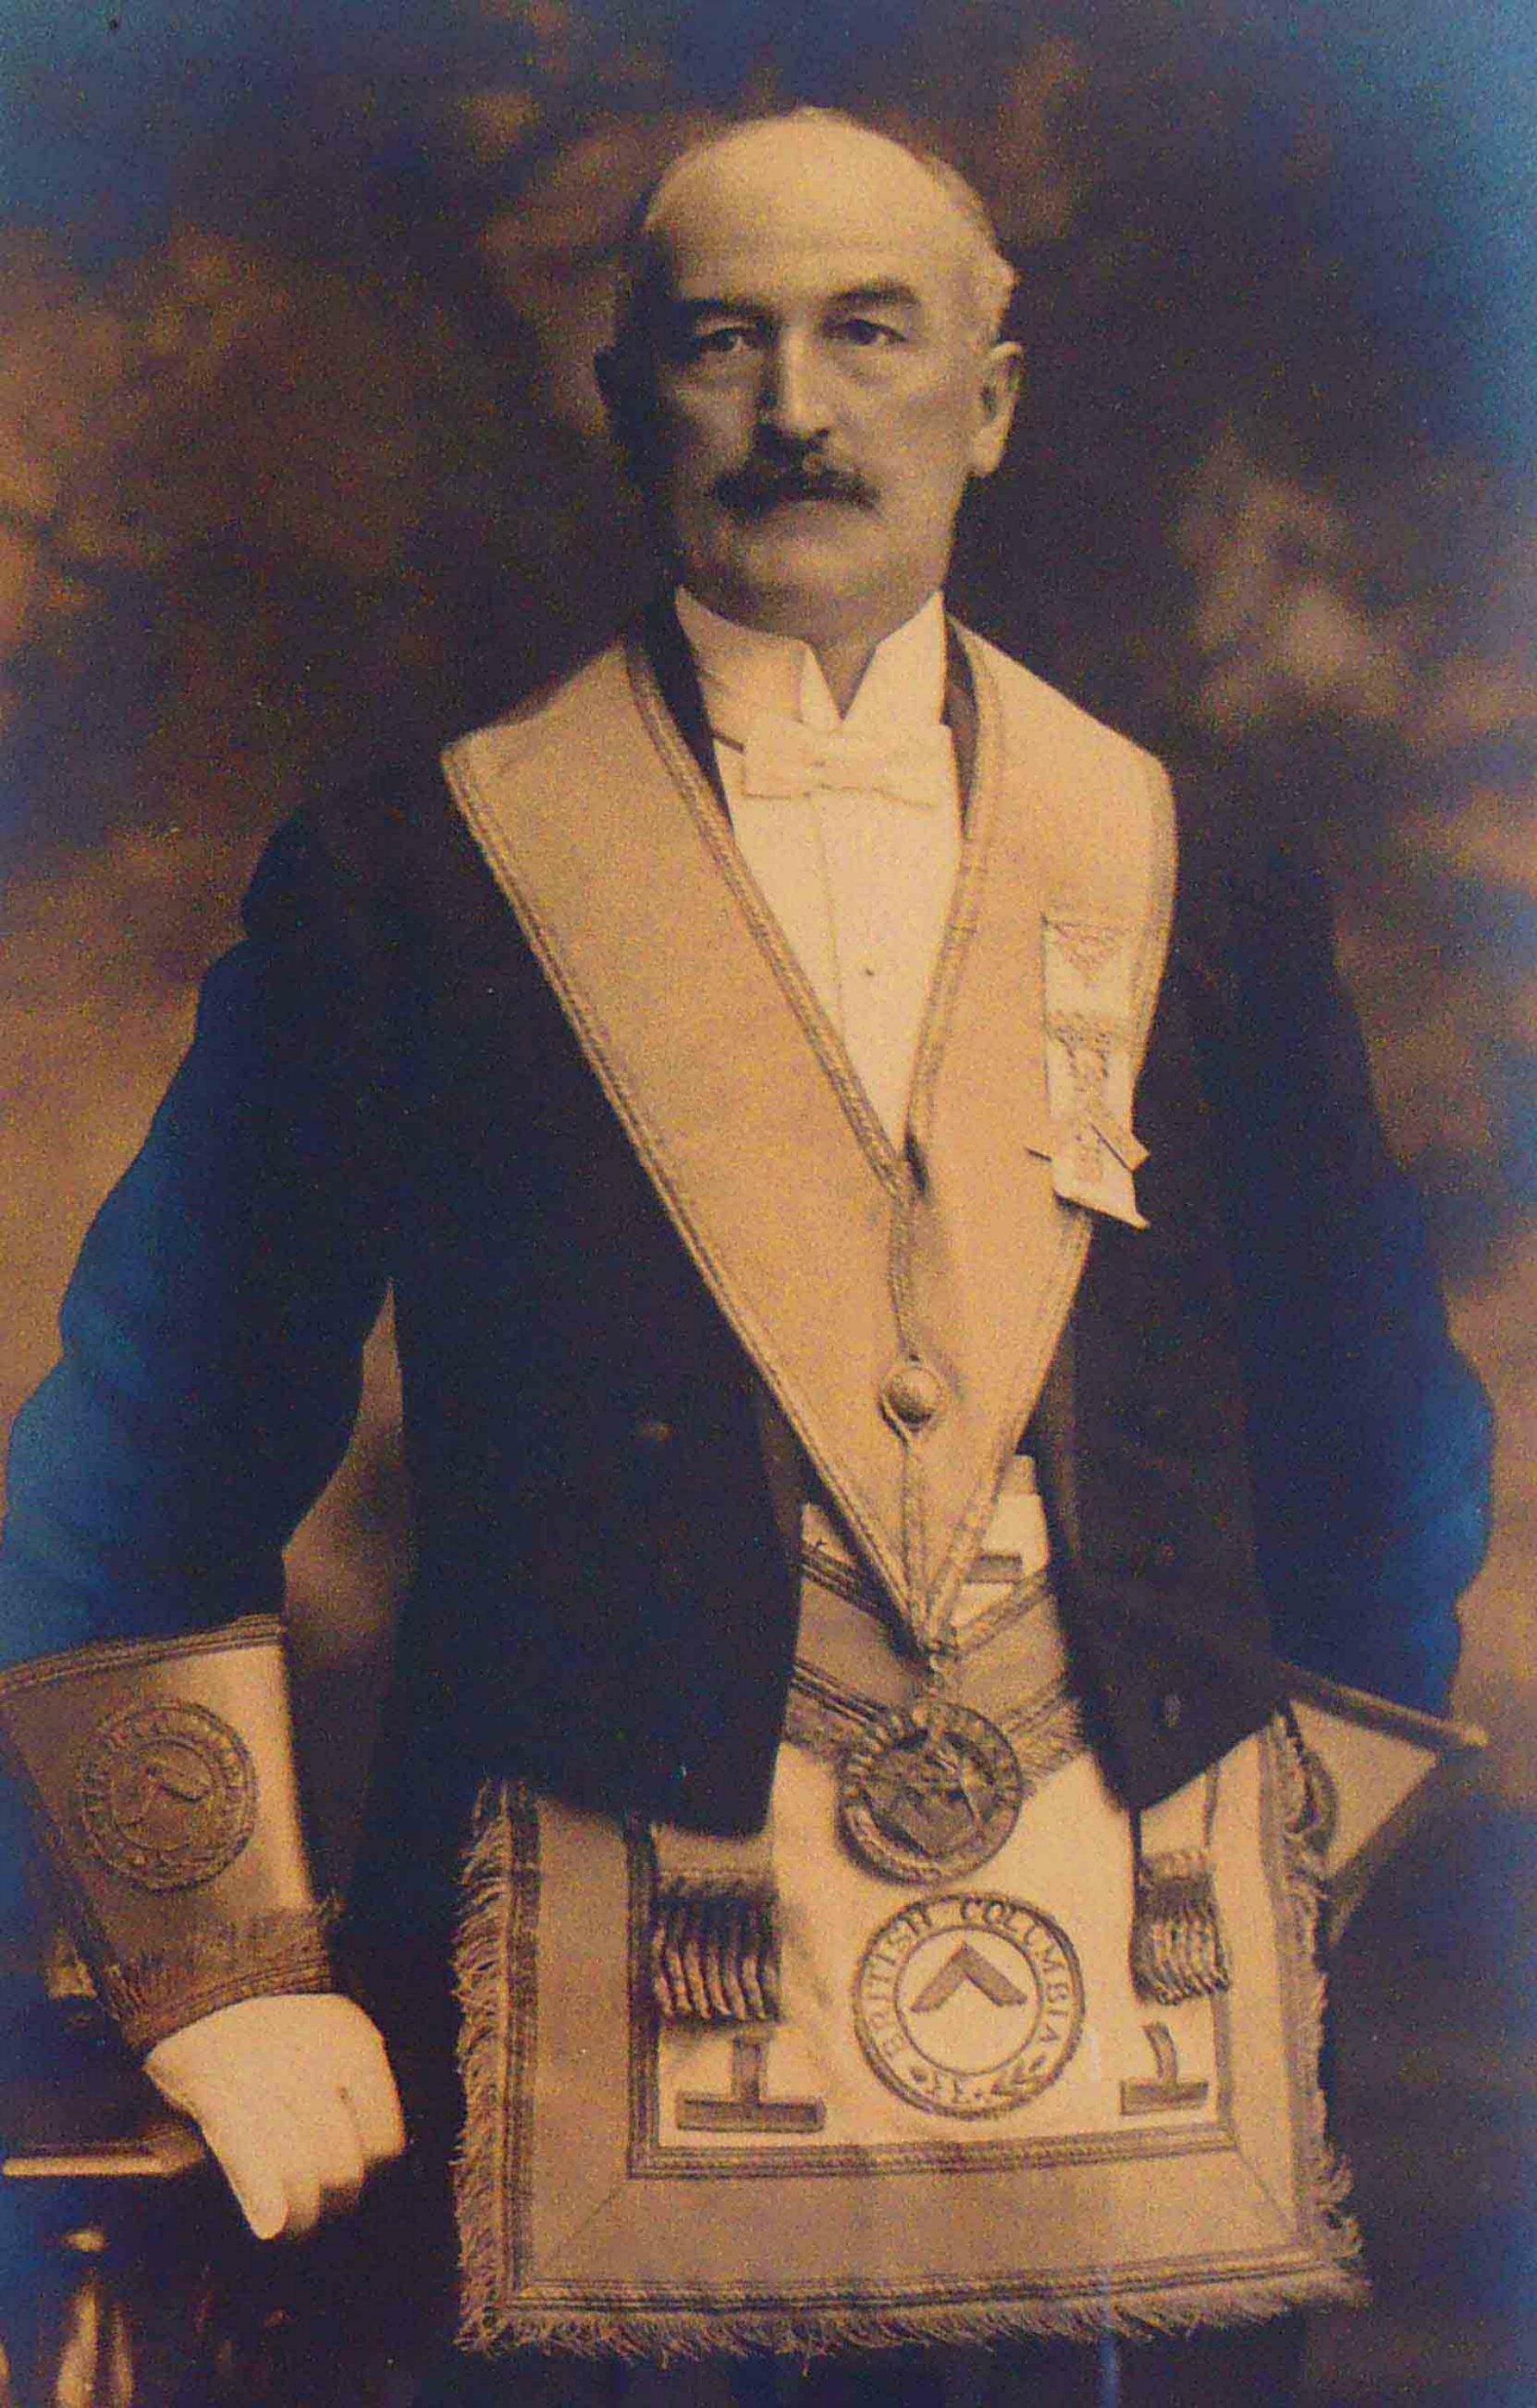 Thomas Pitt as District Deputy Grand Master, 1918